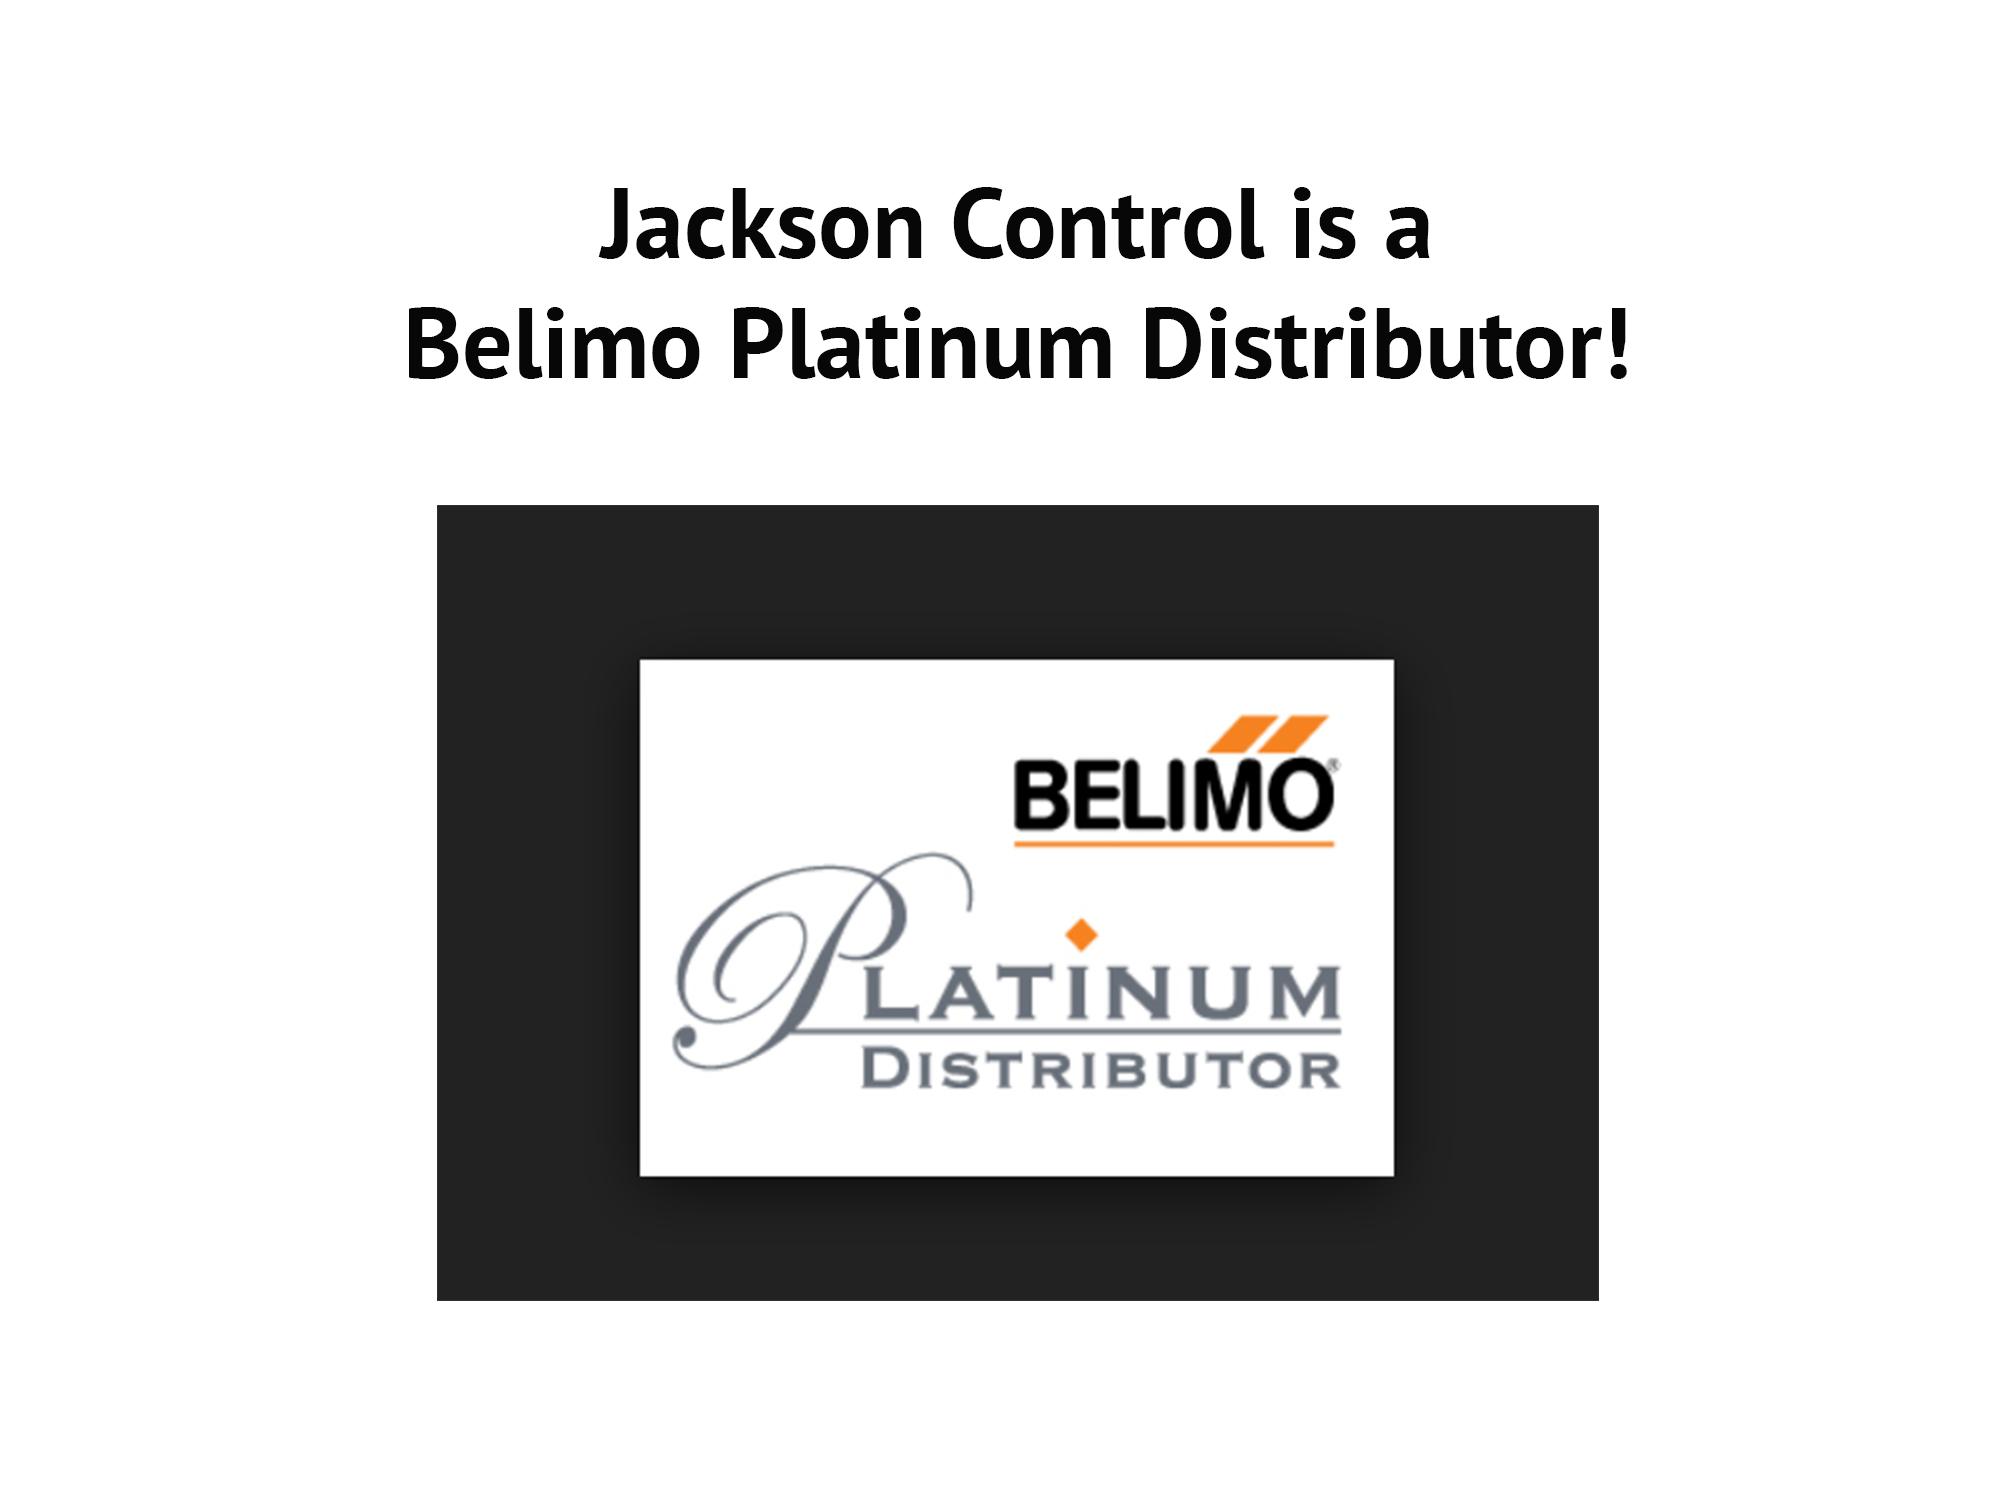 Jackson Control Belimo Platinum Distributor.jpg